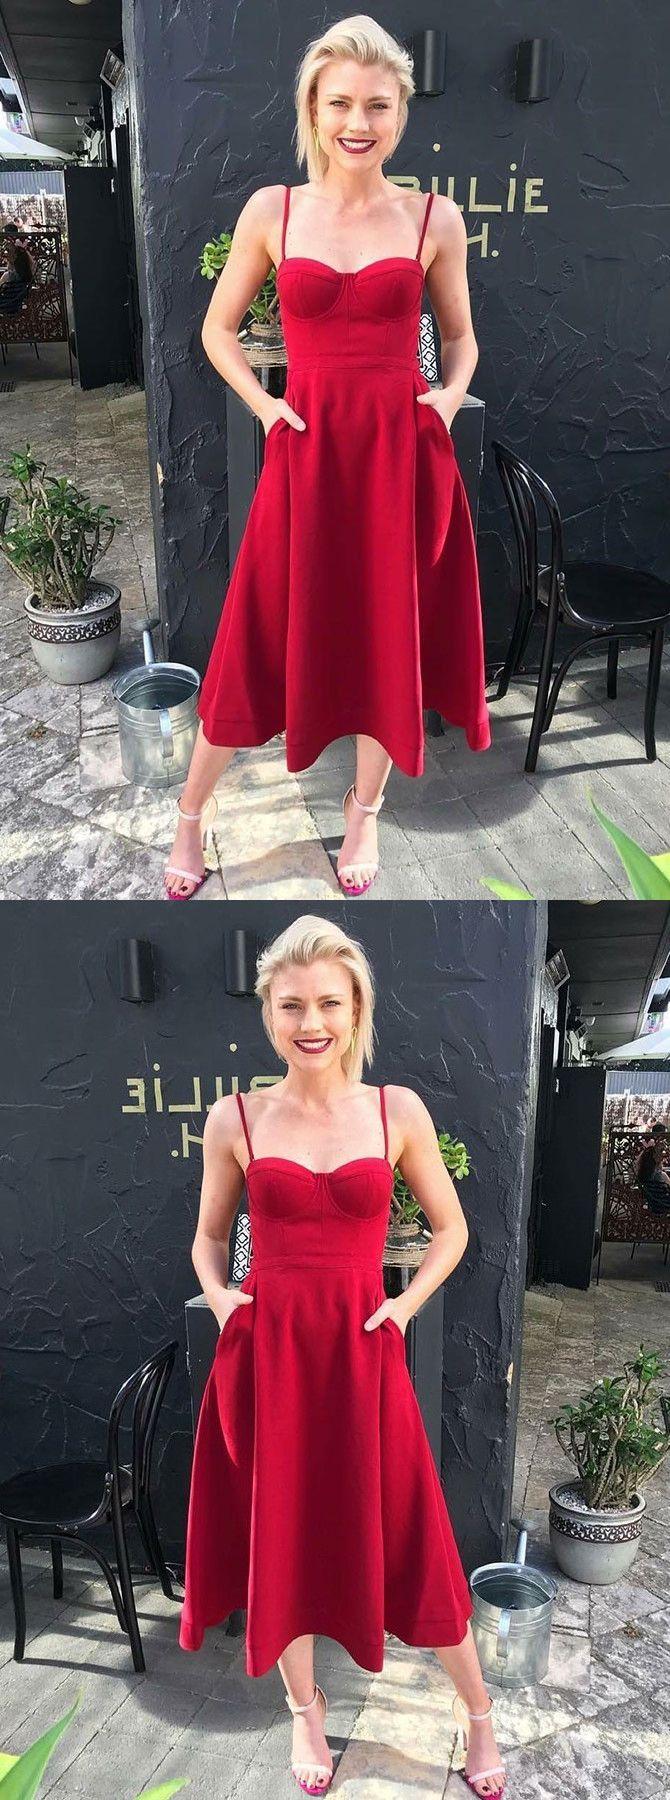 Kurz A-Linie Spaghettiträger Rot Heimkehr Ball Party Kleid ...